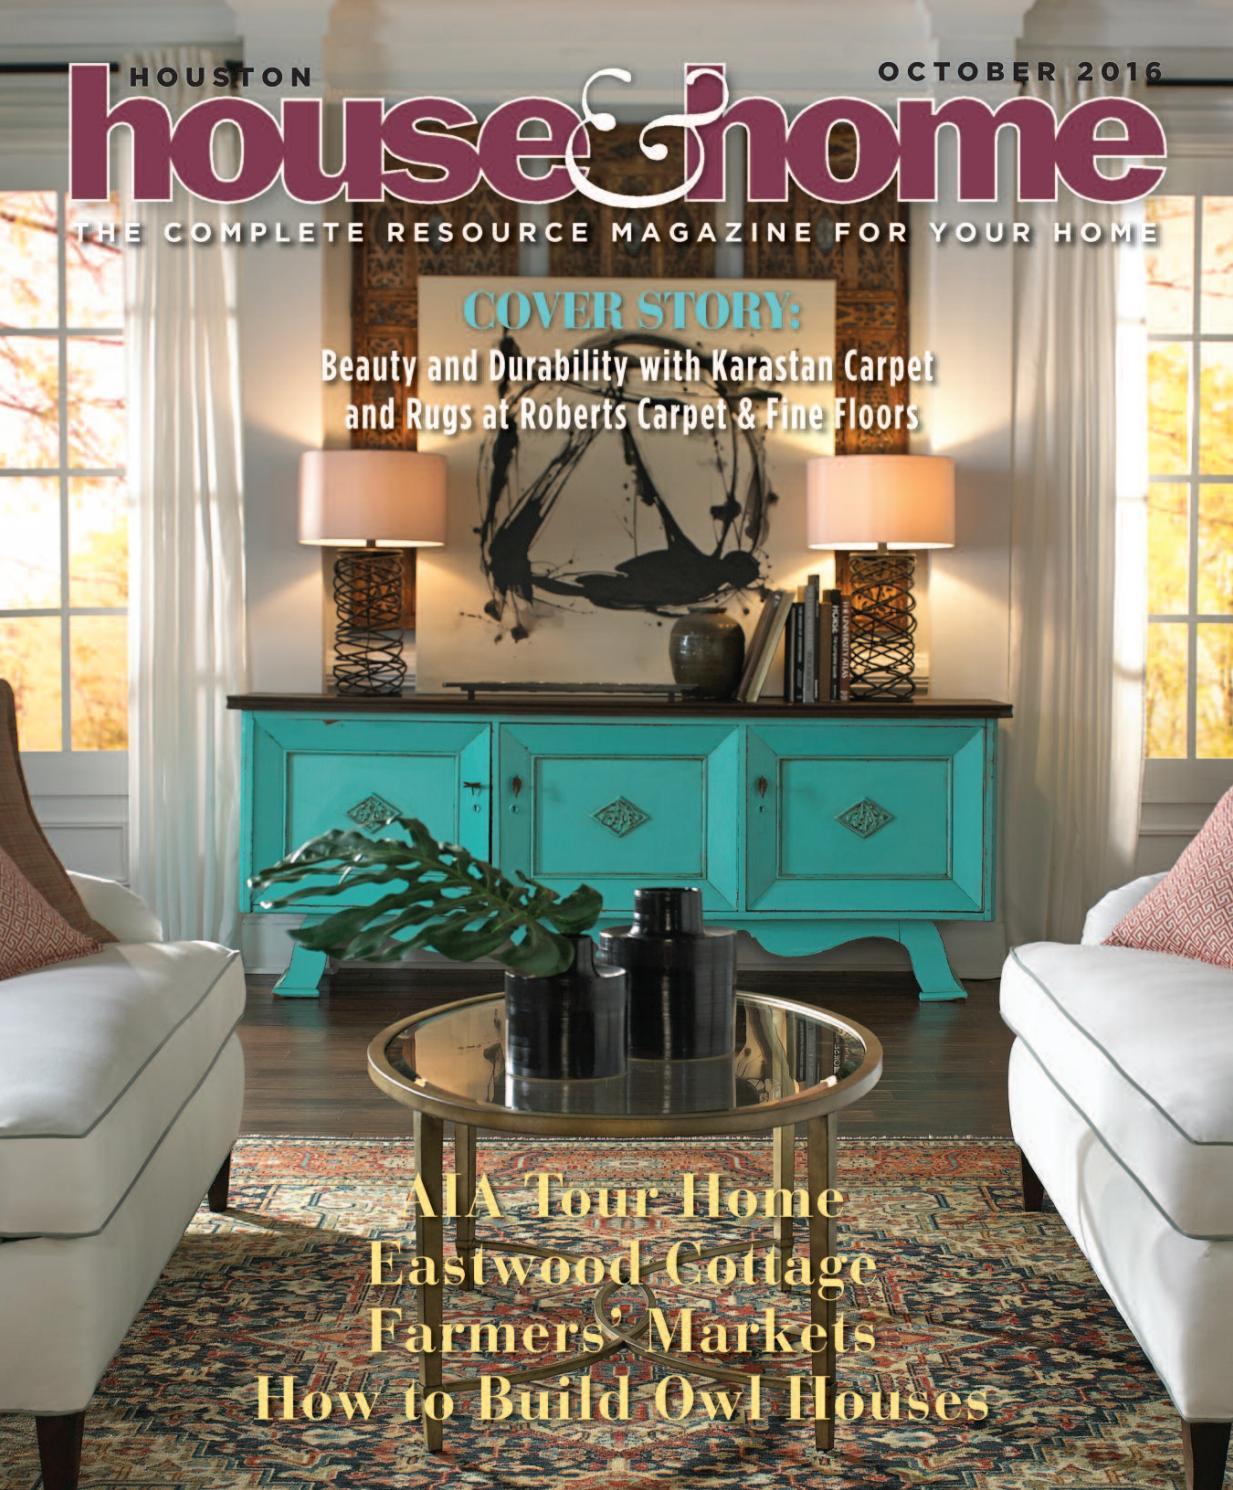 1016 Houhousehome Vir By Houston House Home Magazine Issuu